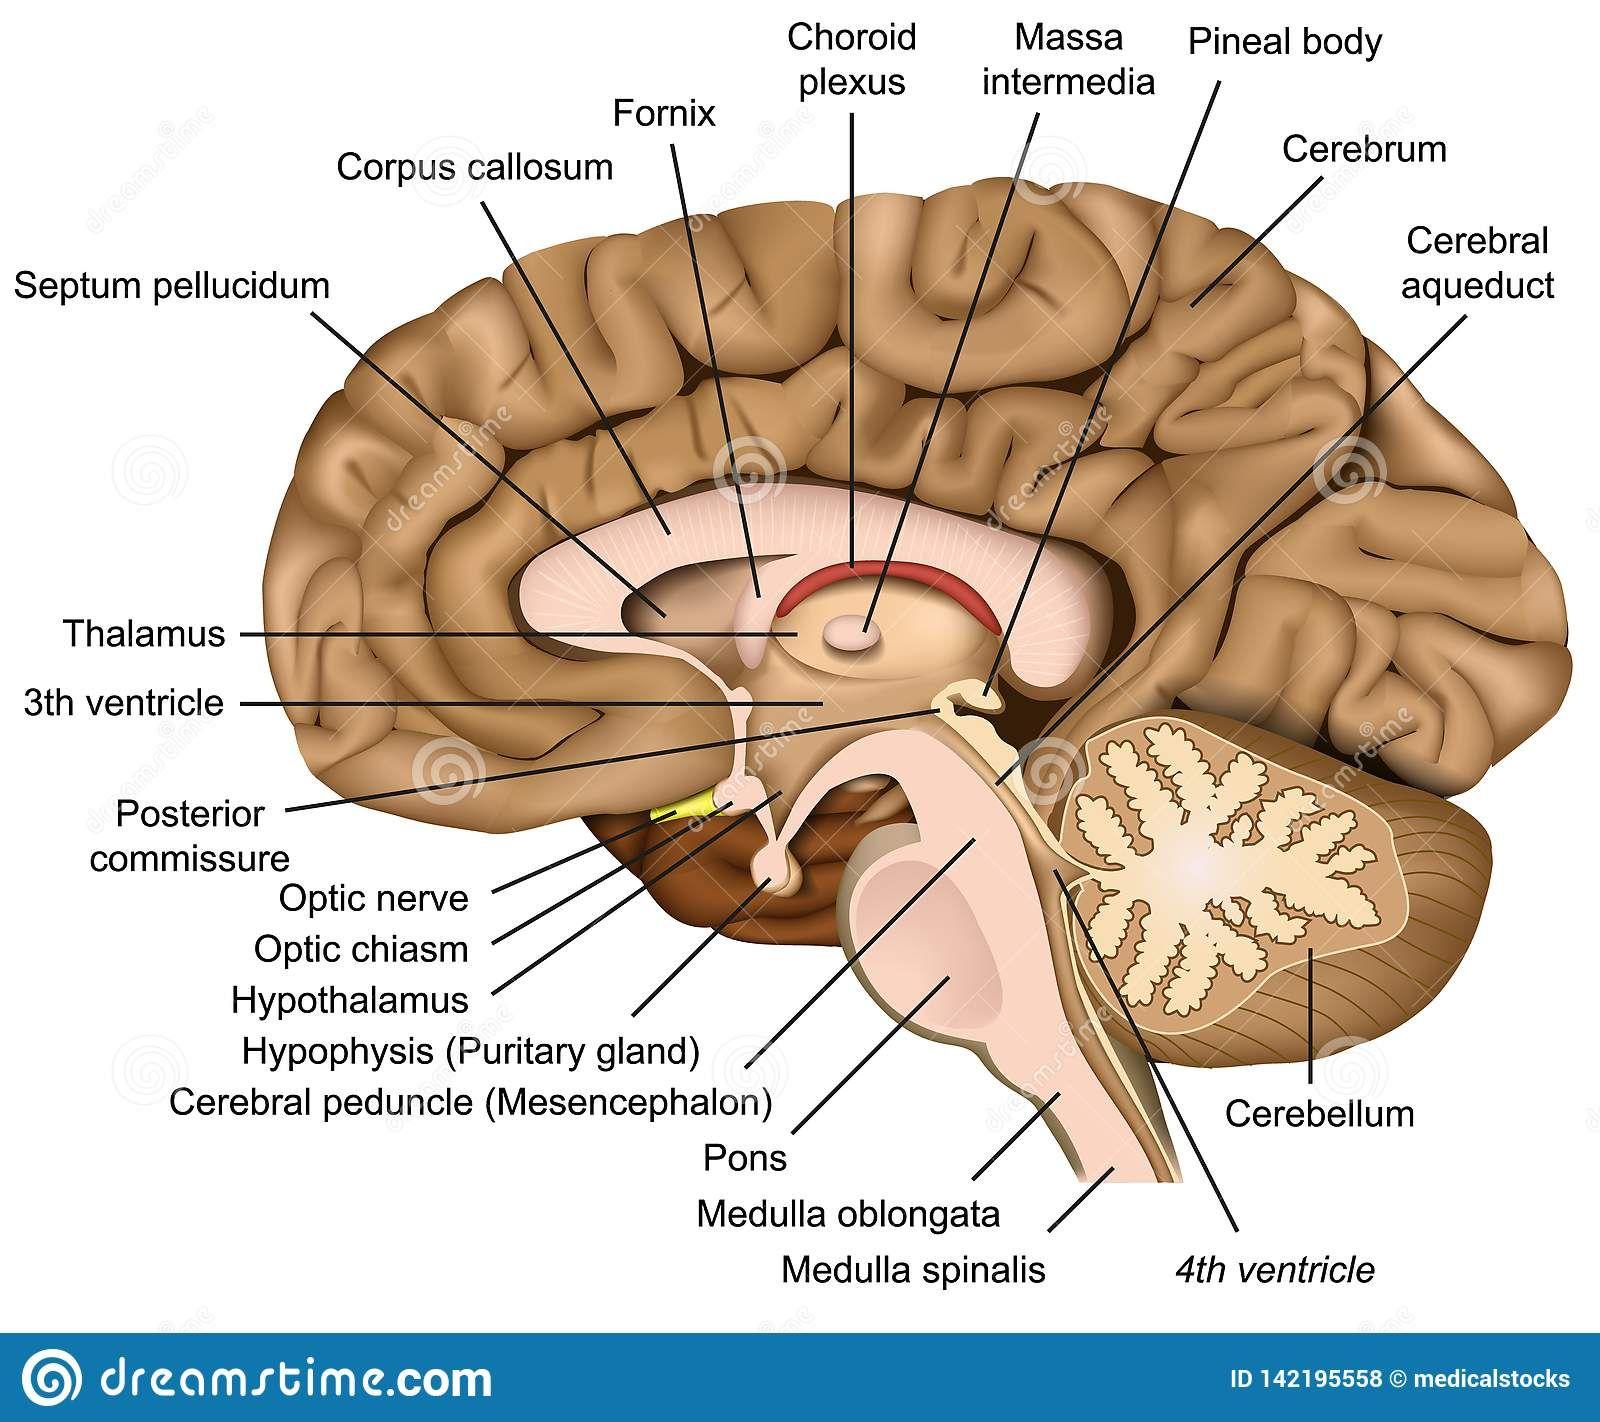 Pin by Alade Isaiah on Human brain anatomy | Brain anatomy ...